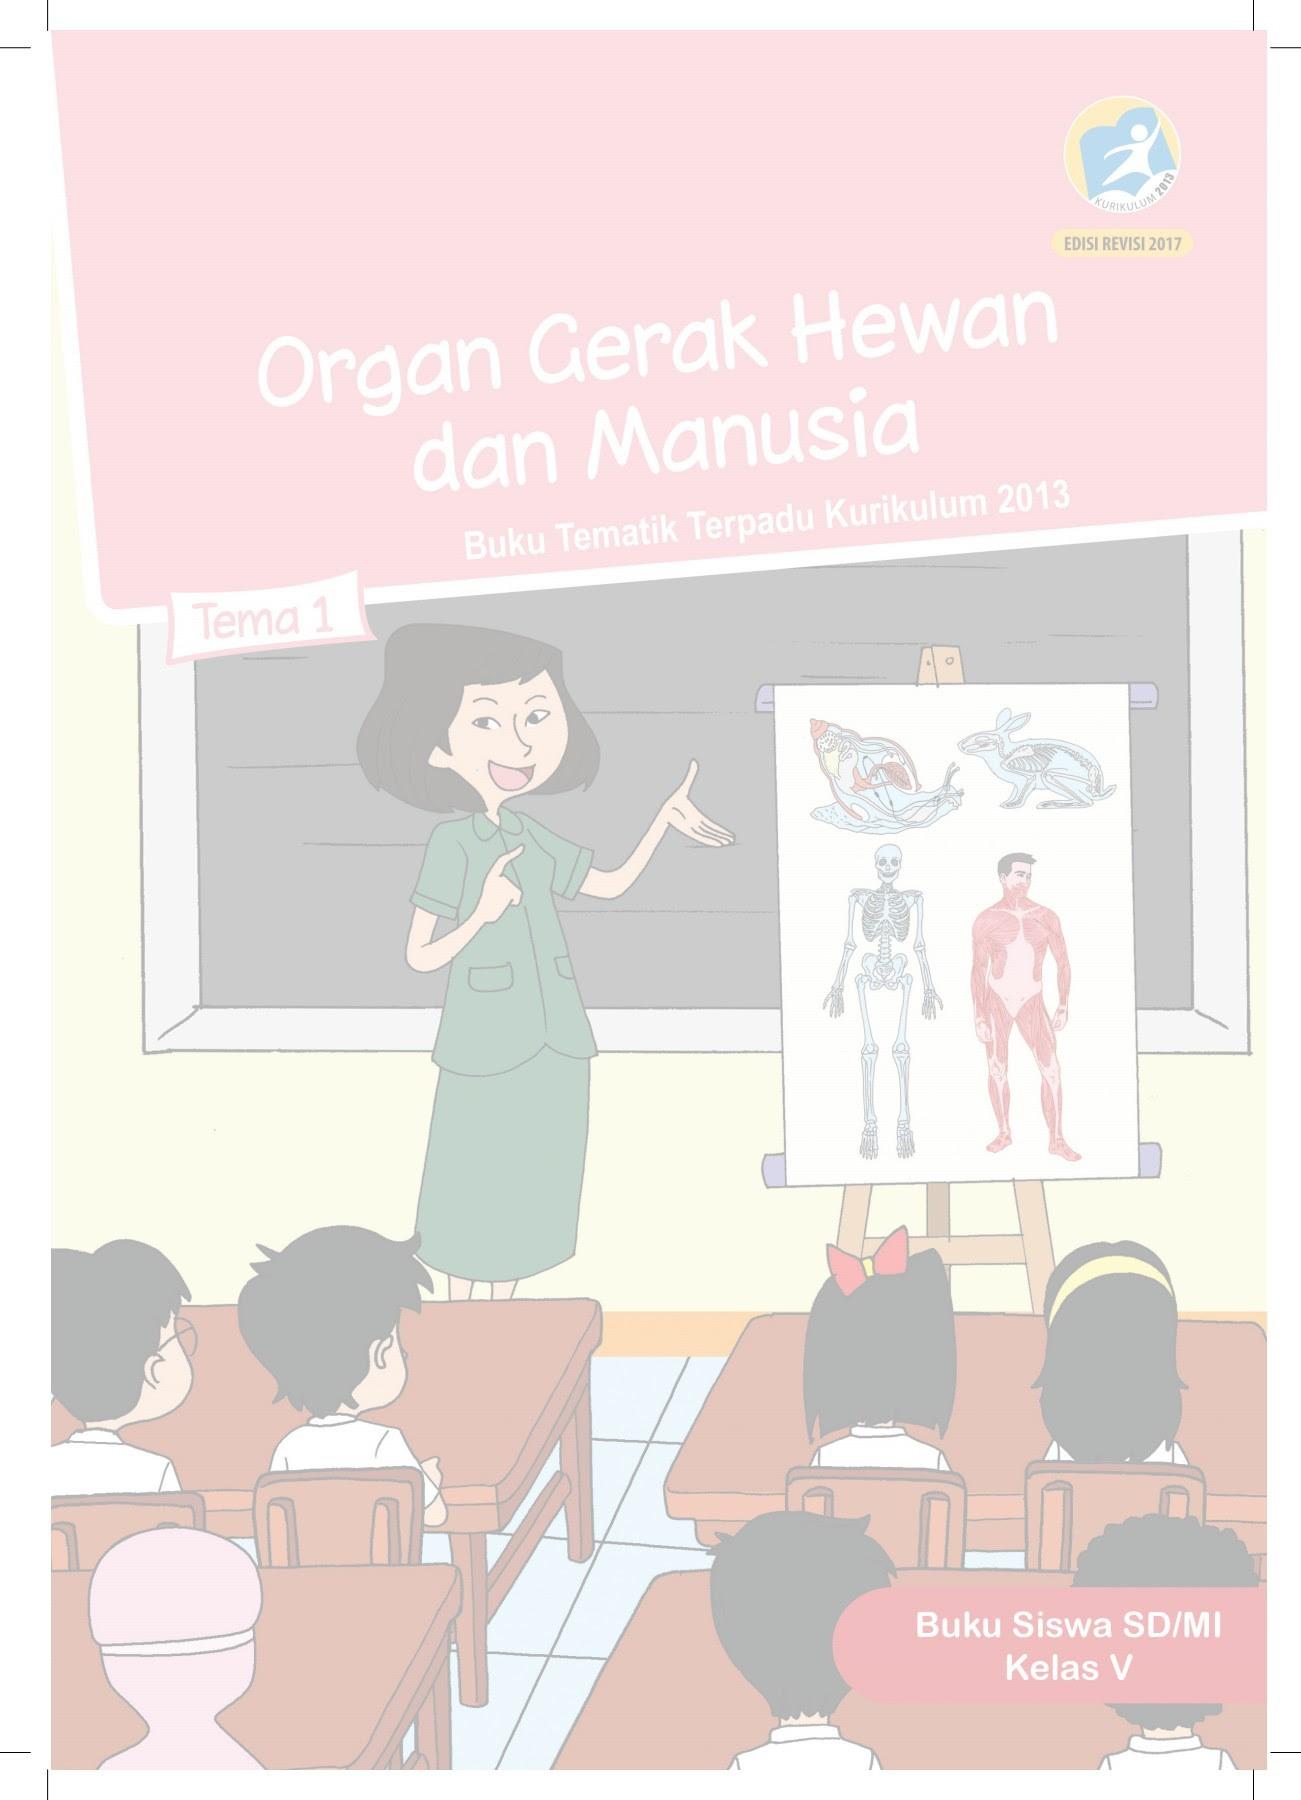 77 Gambar Organ Gerak Pada Hewan Kelinci Terbaru